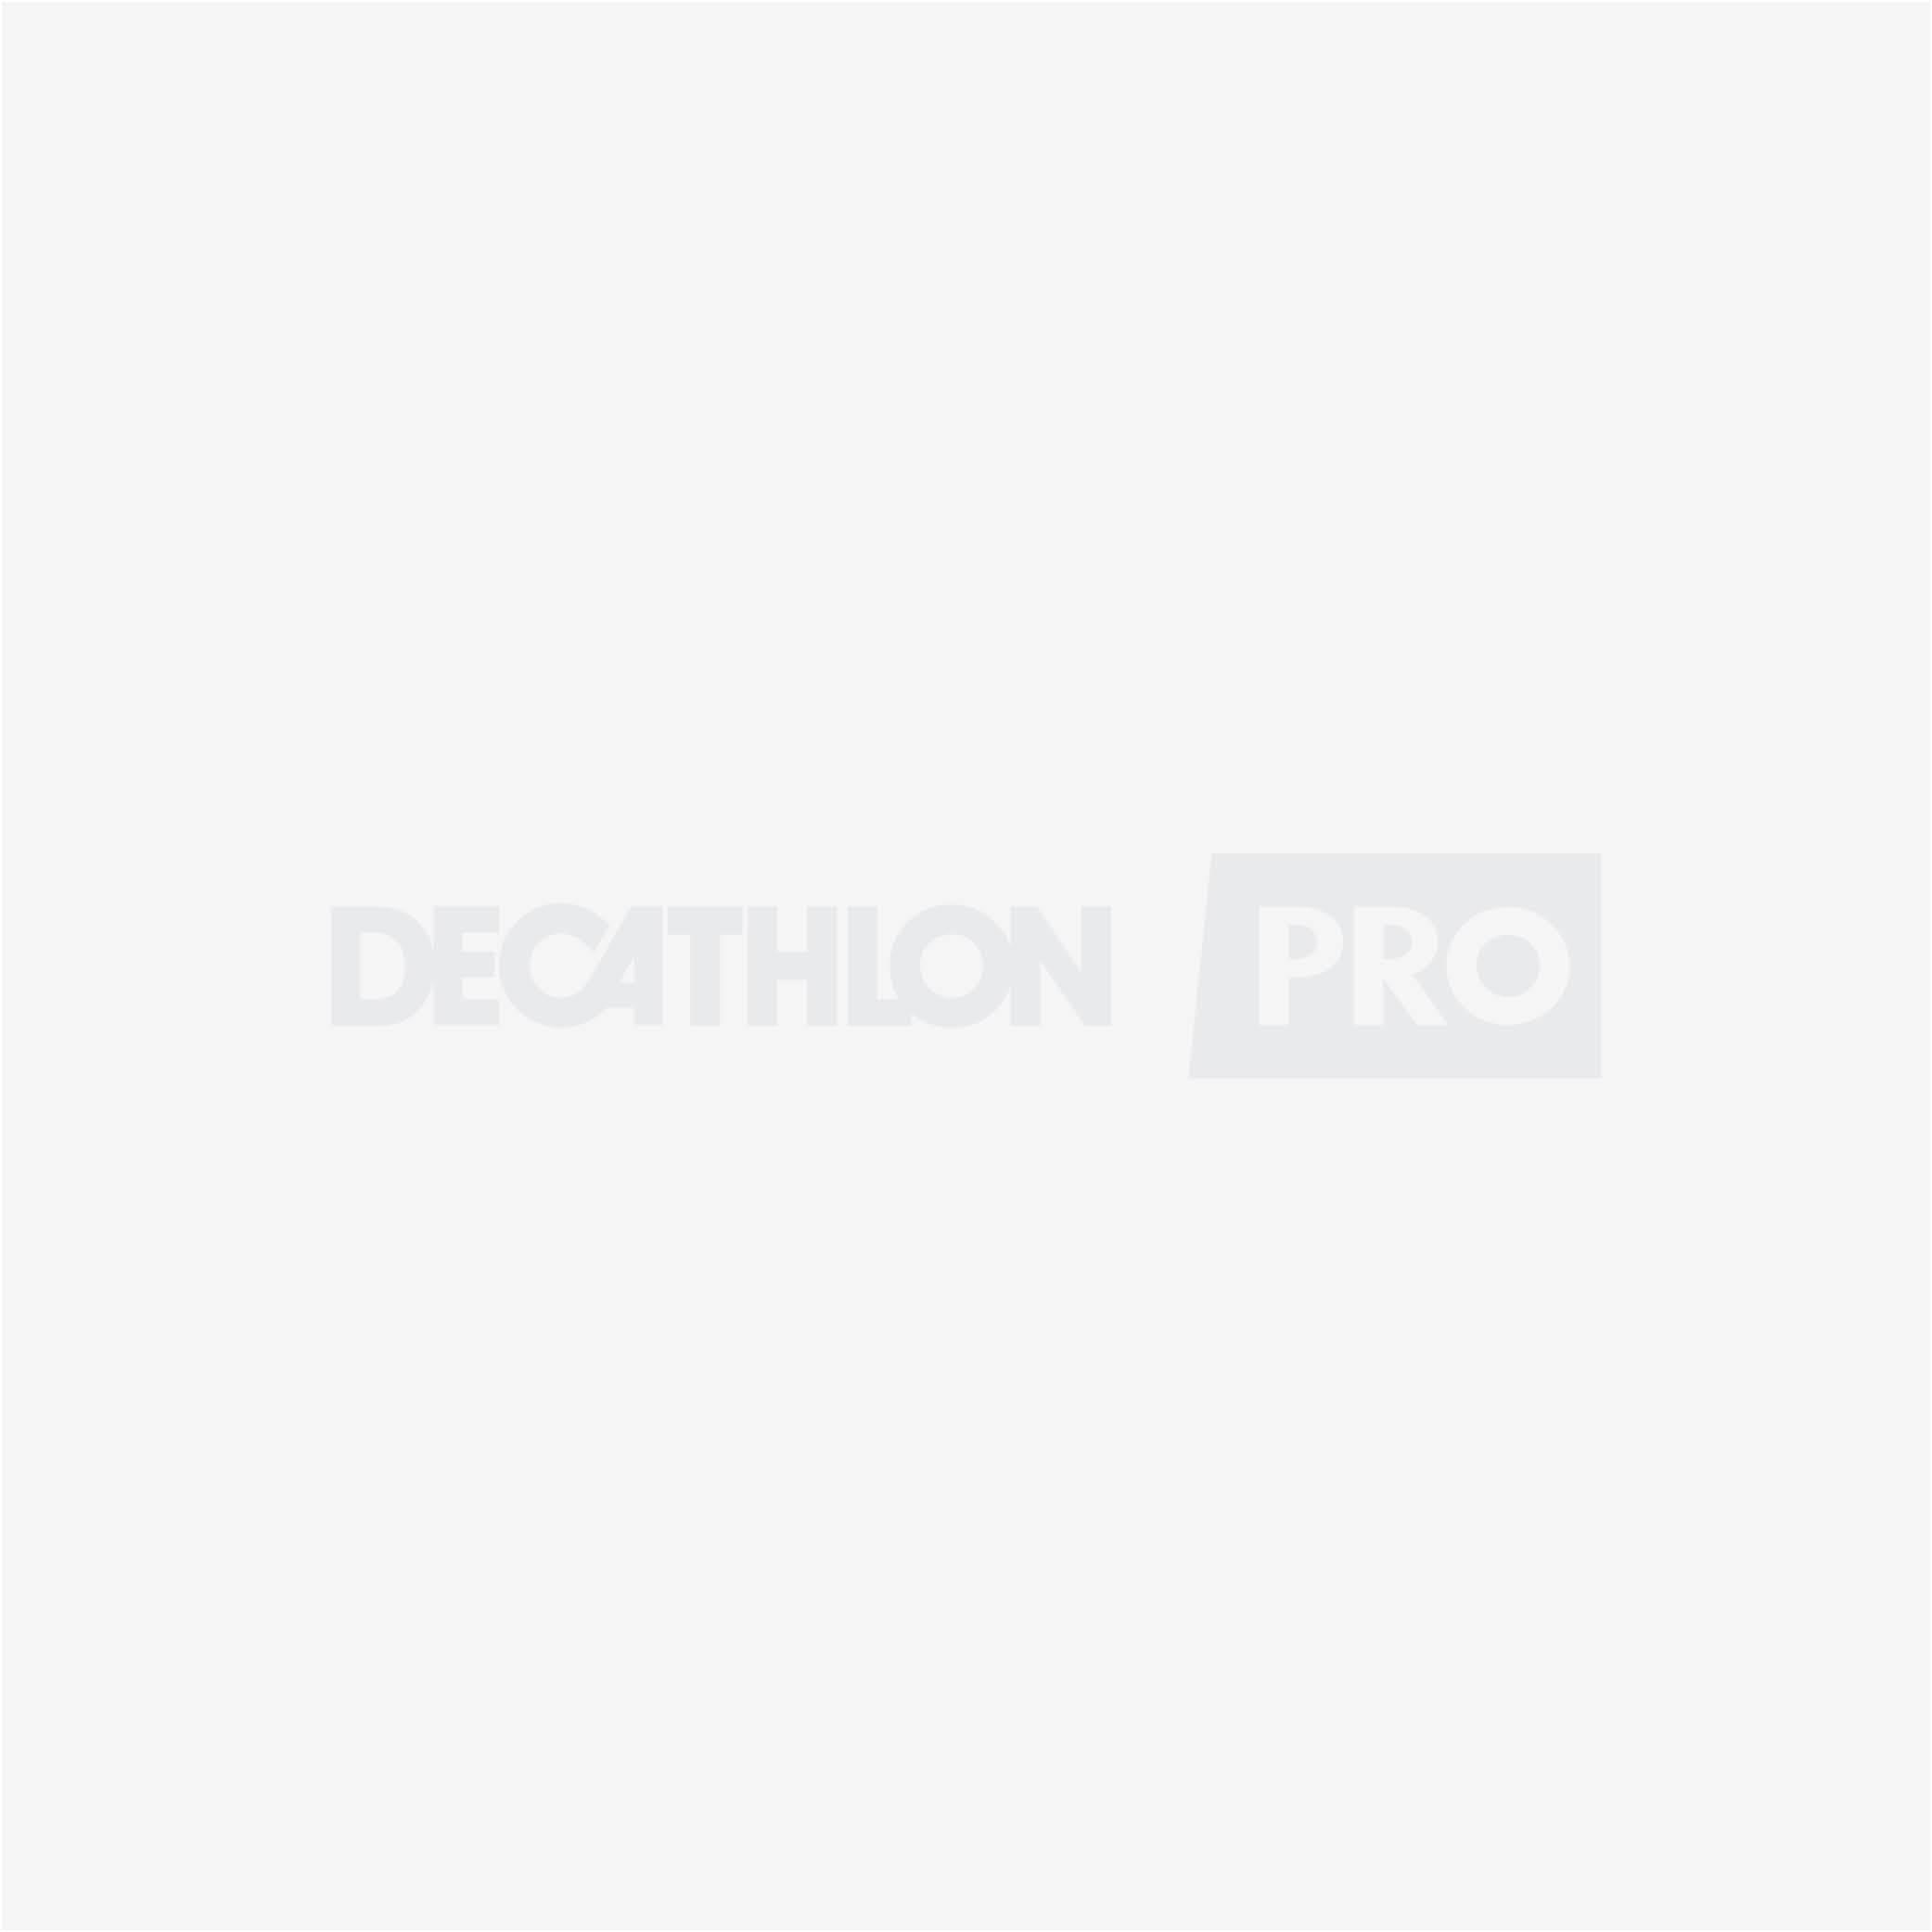 S14_BAN_TATAMI.jpg